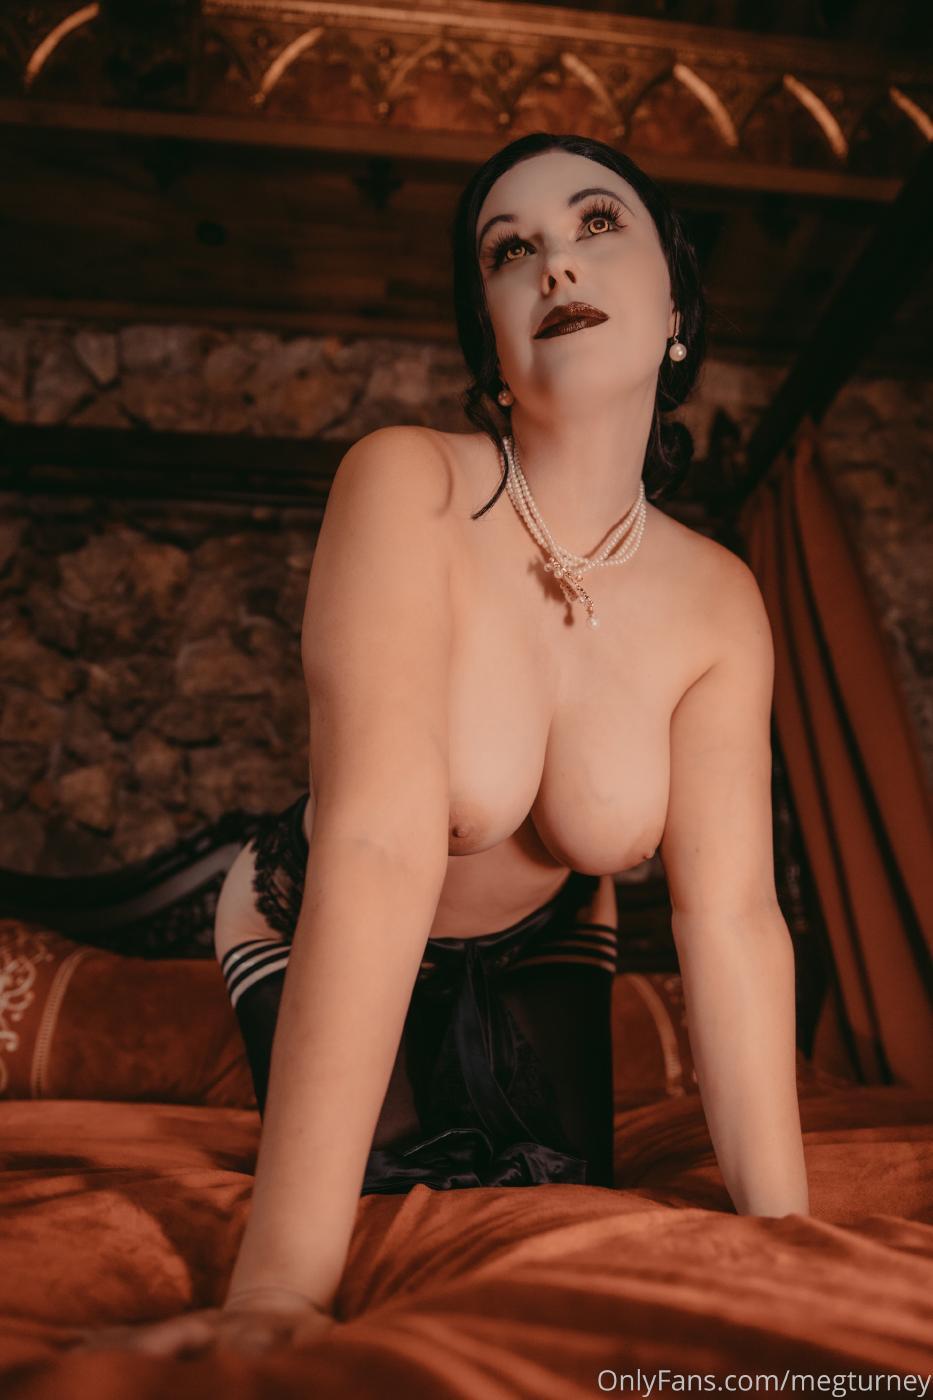 Meg Turney Lady Dimitrescu Cosplay Onlyfans Set Leaked 0019